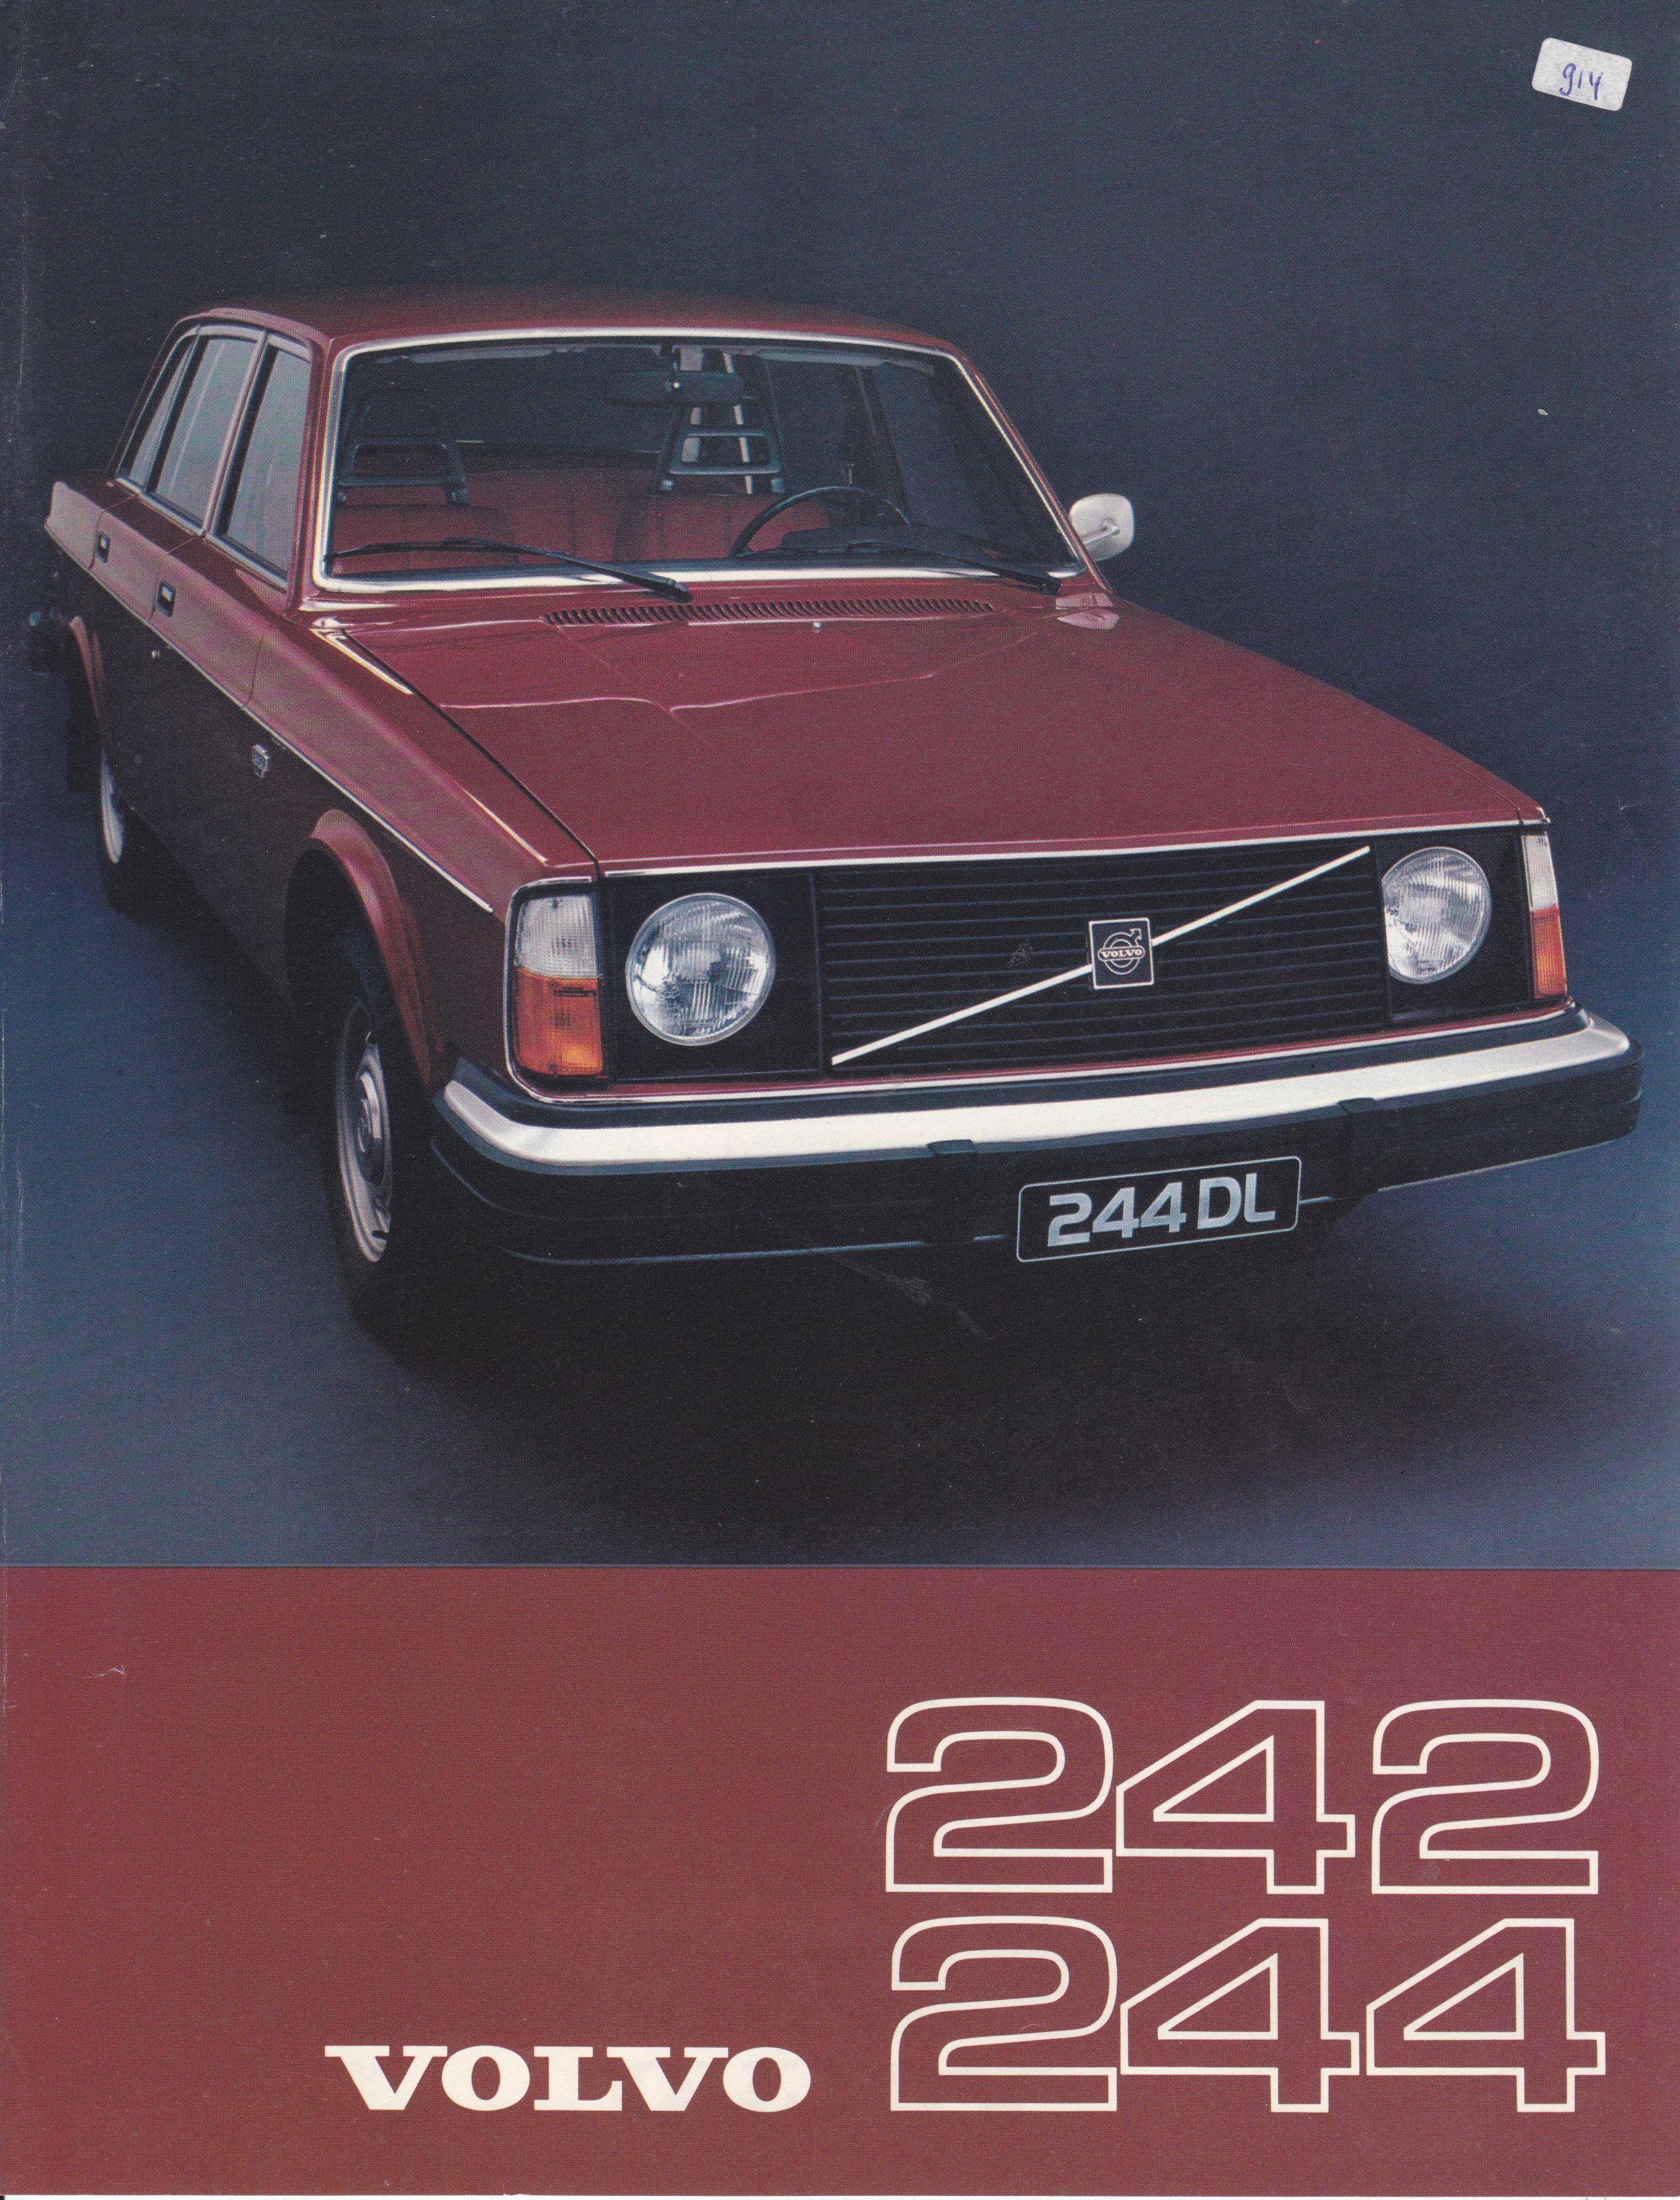 Volvo 242 244 Saloon Leaflet Dutch 2911 76 Car Advertising Volvo Cars